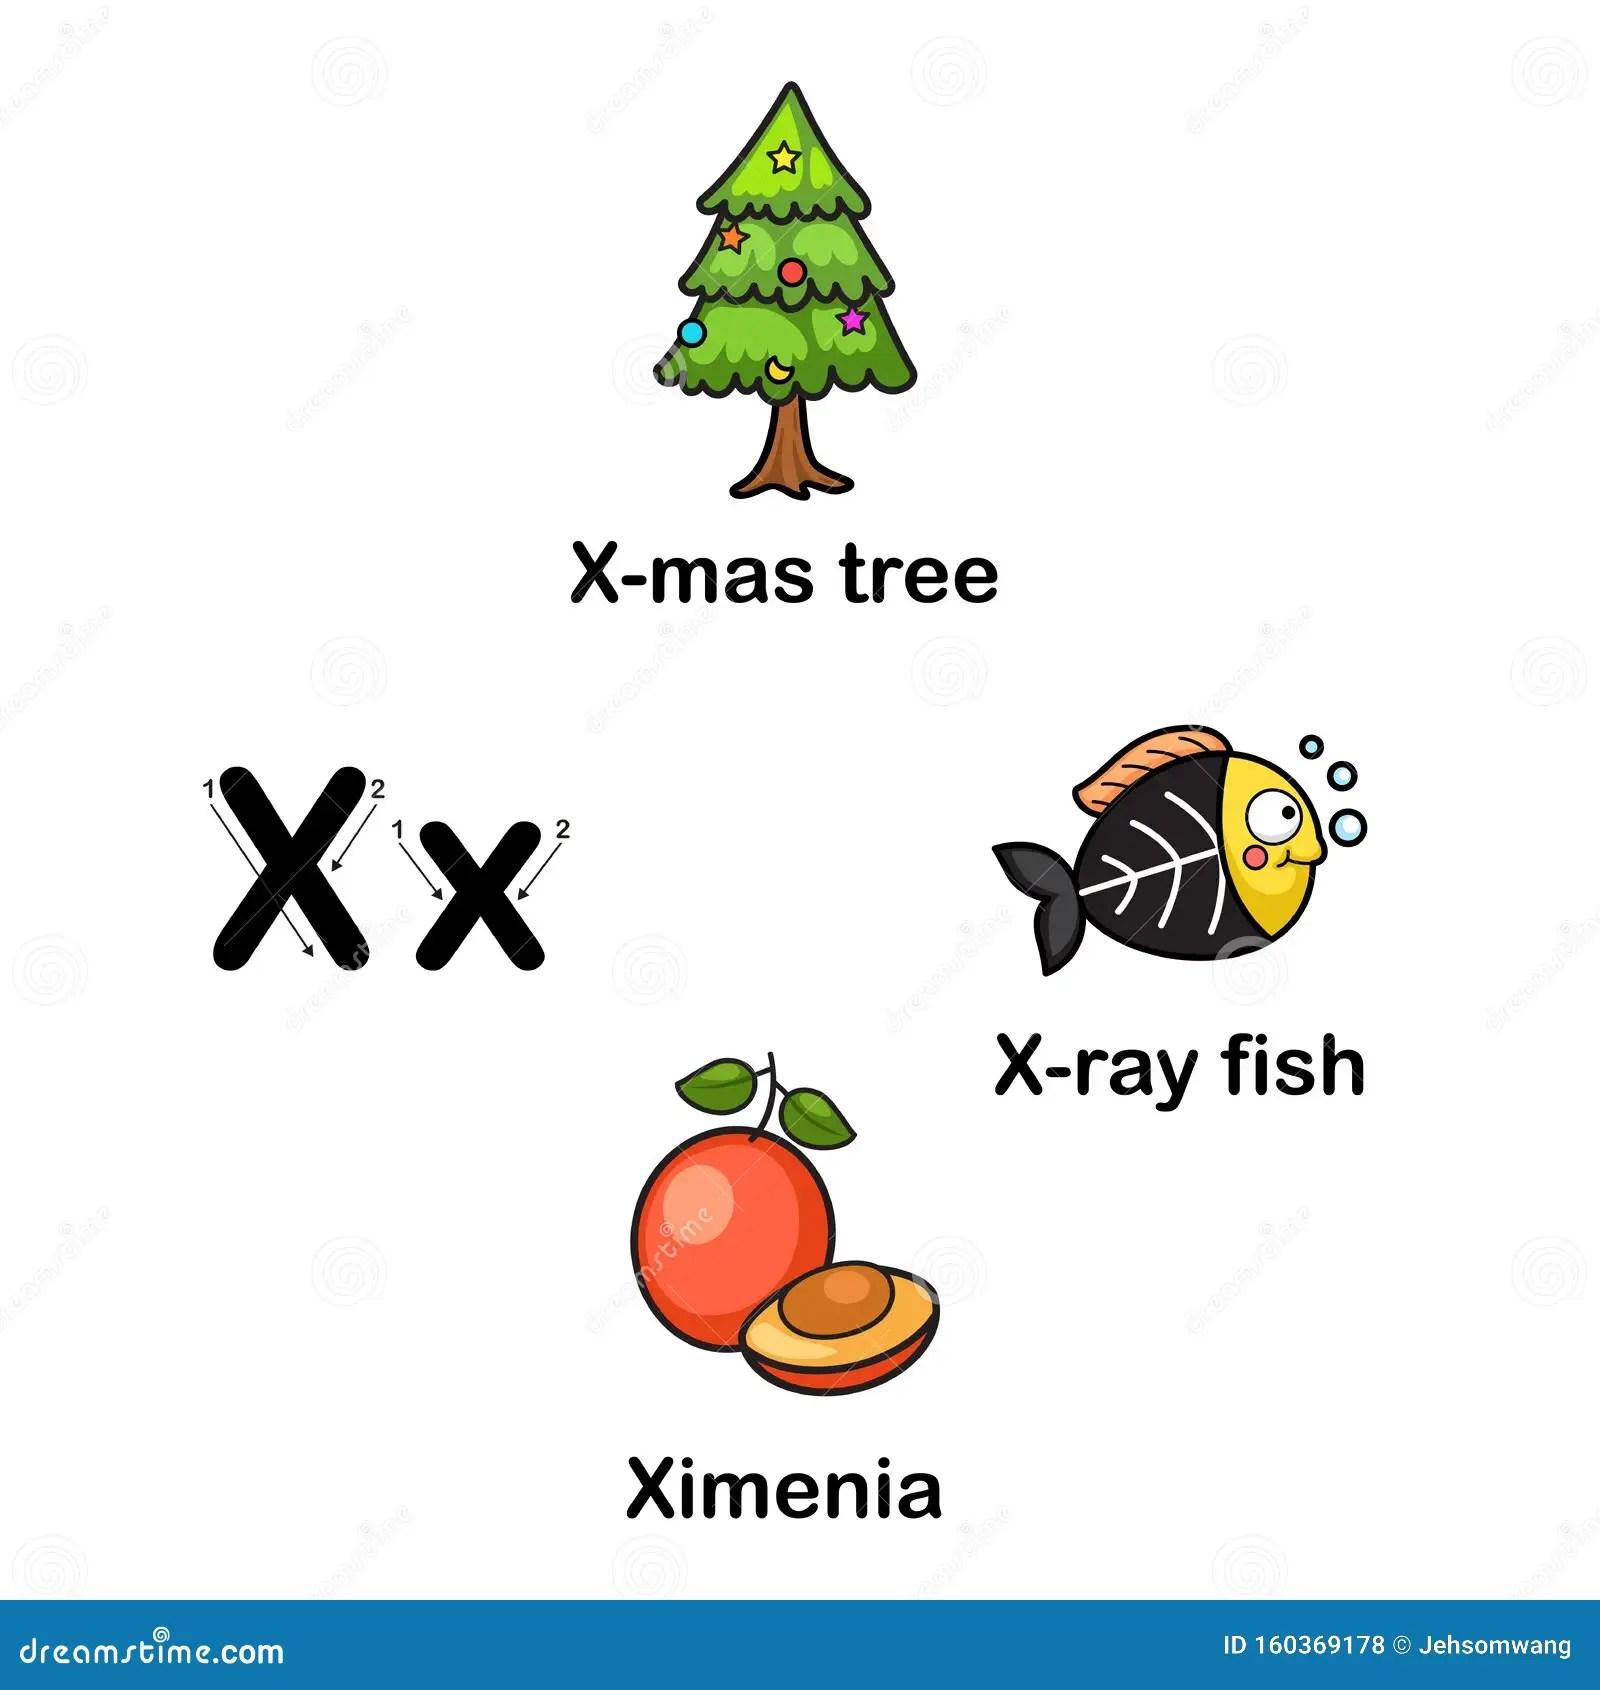 Alphabet Letter X X Mas Tree Ximenia X Ray Fish Stock